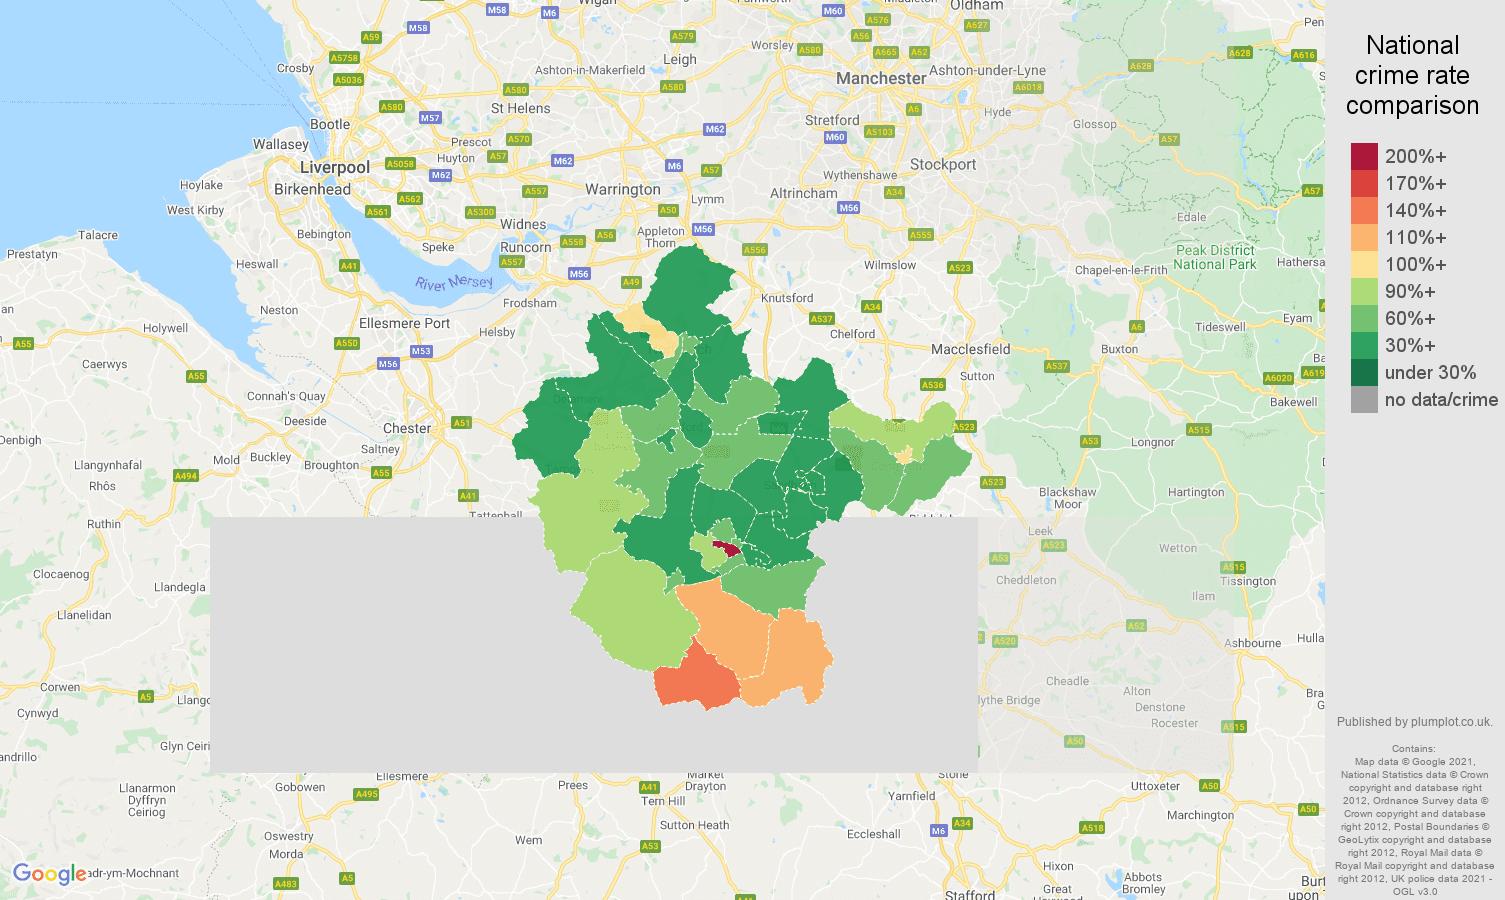 Crewe burglary crime rate comparison map